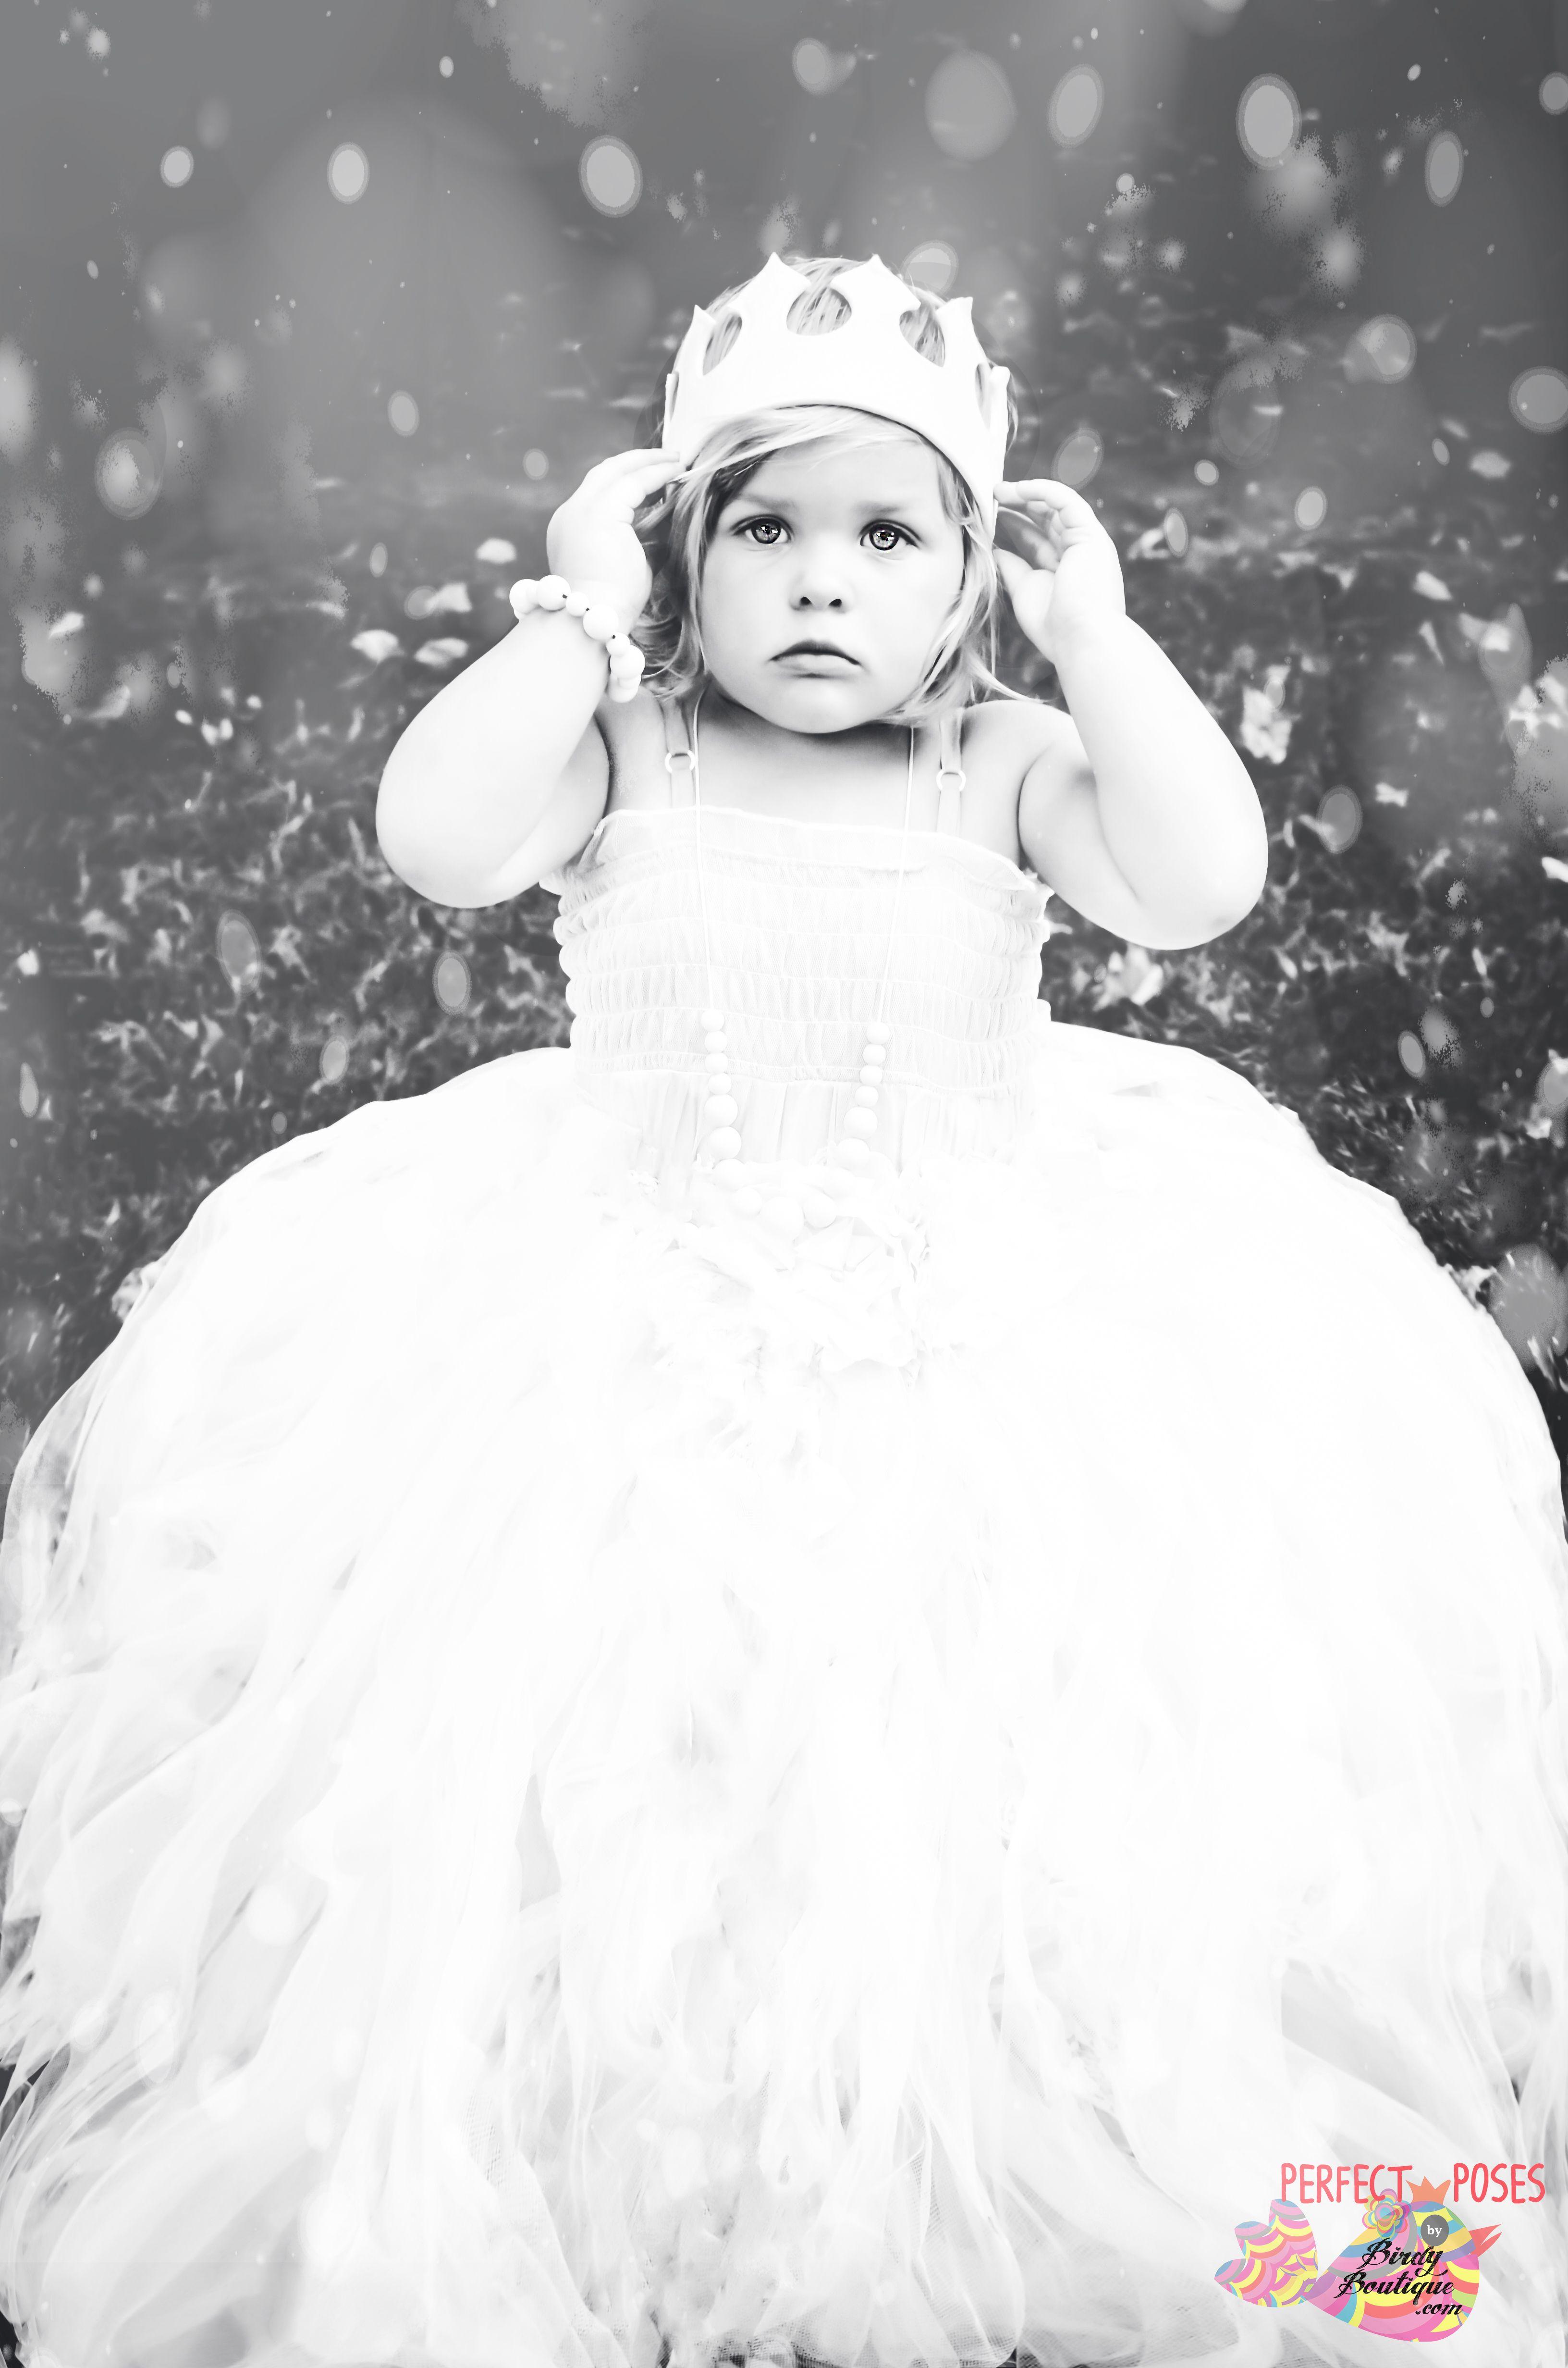 snow princess toddler baby girls 1 year old 18 month